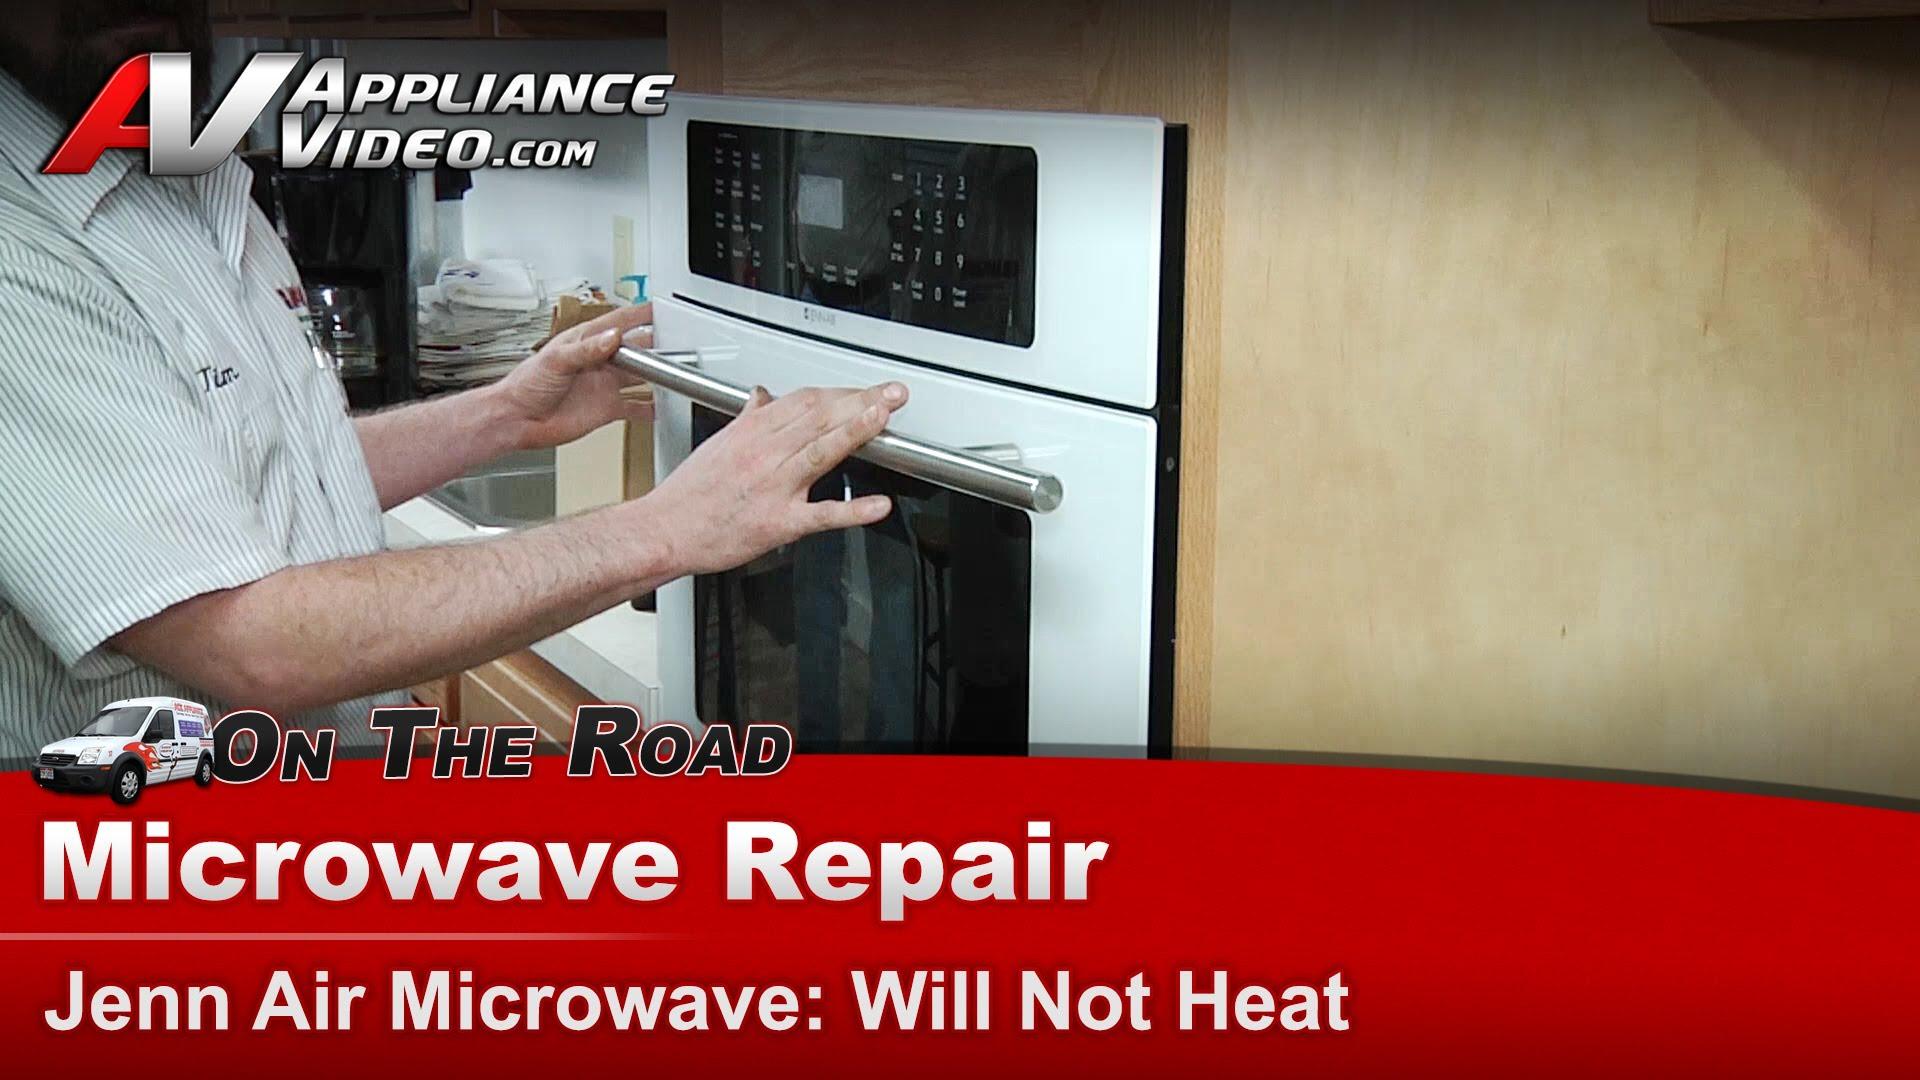 Jenn-Air JMC8130DDC Microwave Repair – Will not heat – Magnetron |  Appliance Video